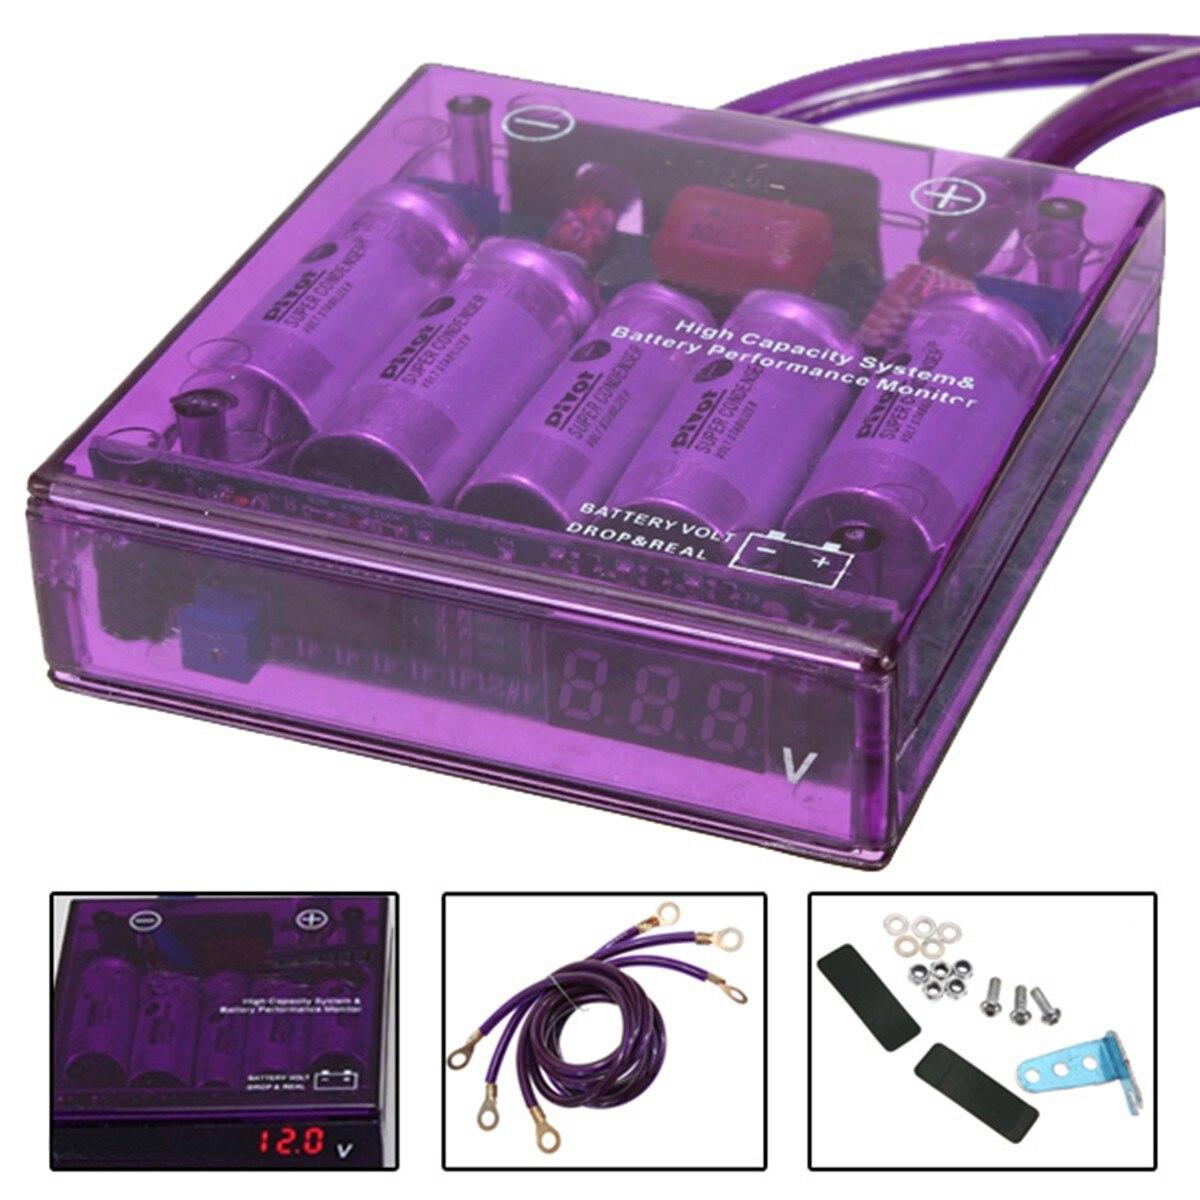 1Pc Purple Universal Car Truck Fuel Saver Voltage STABILIZER REGULATOR PIVOT MEGA RAIZIN KIT